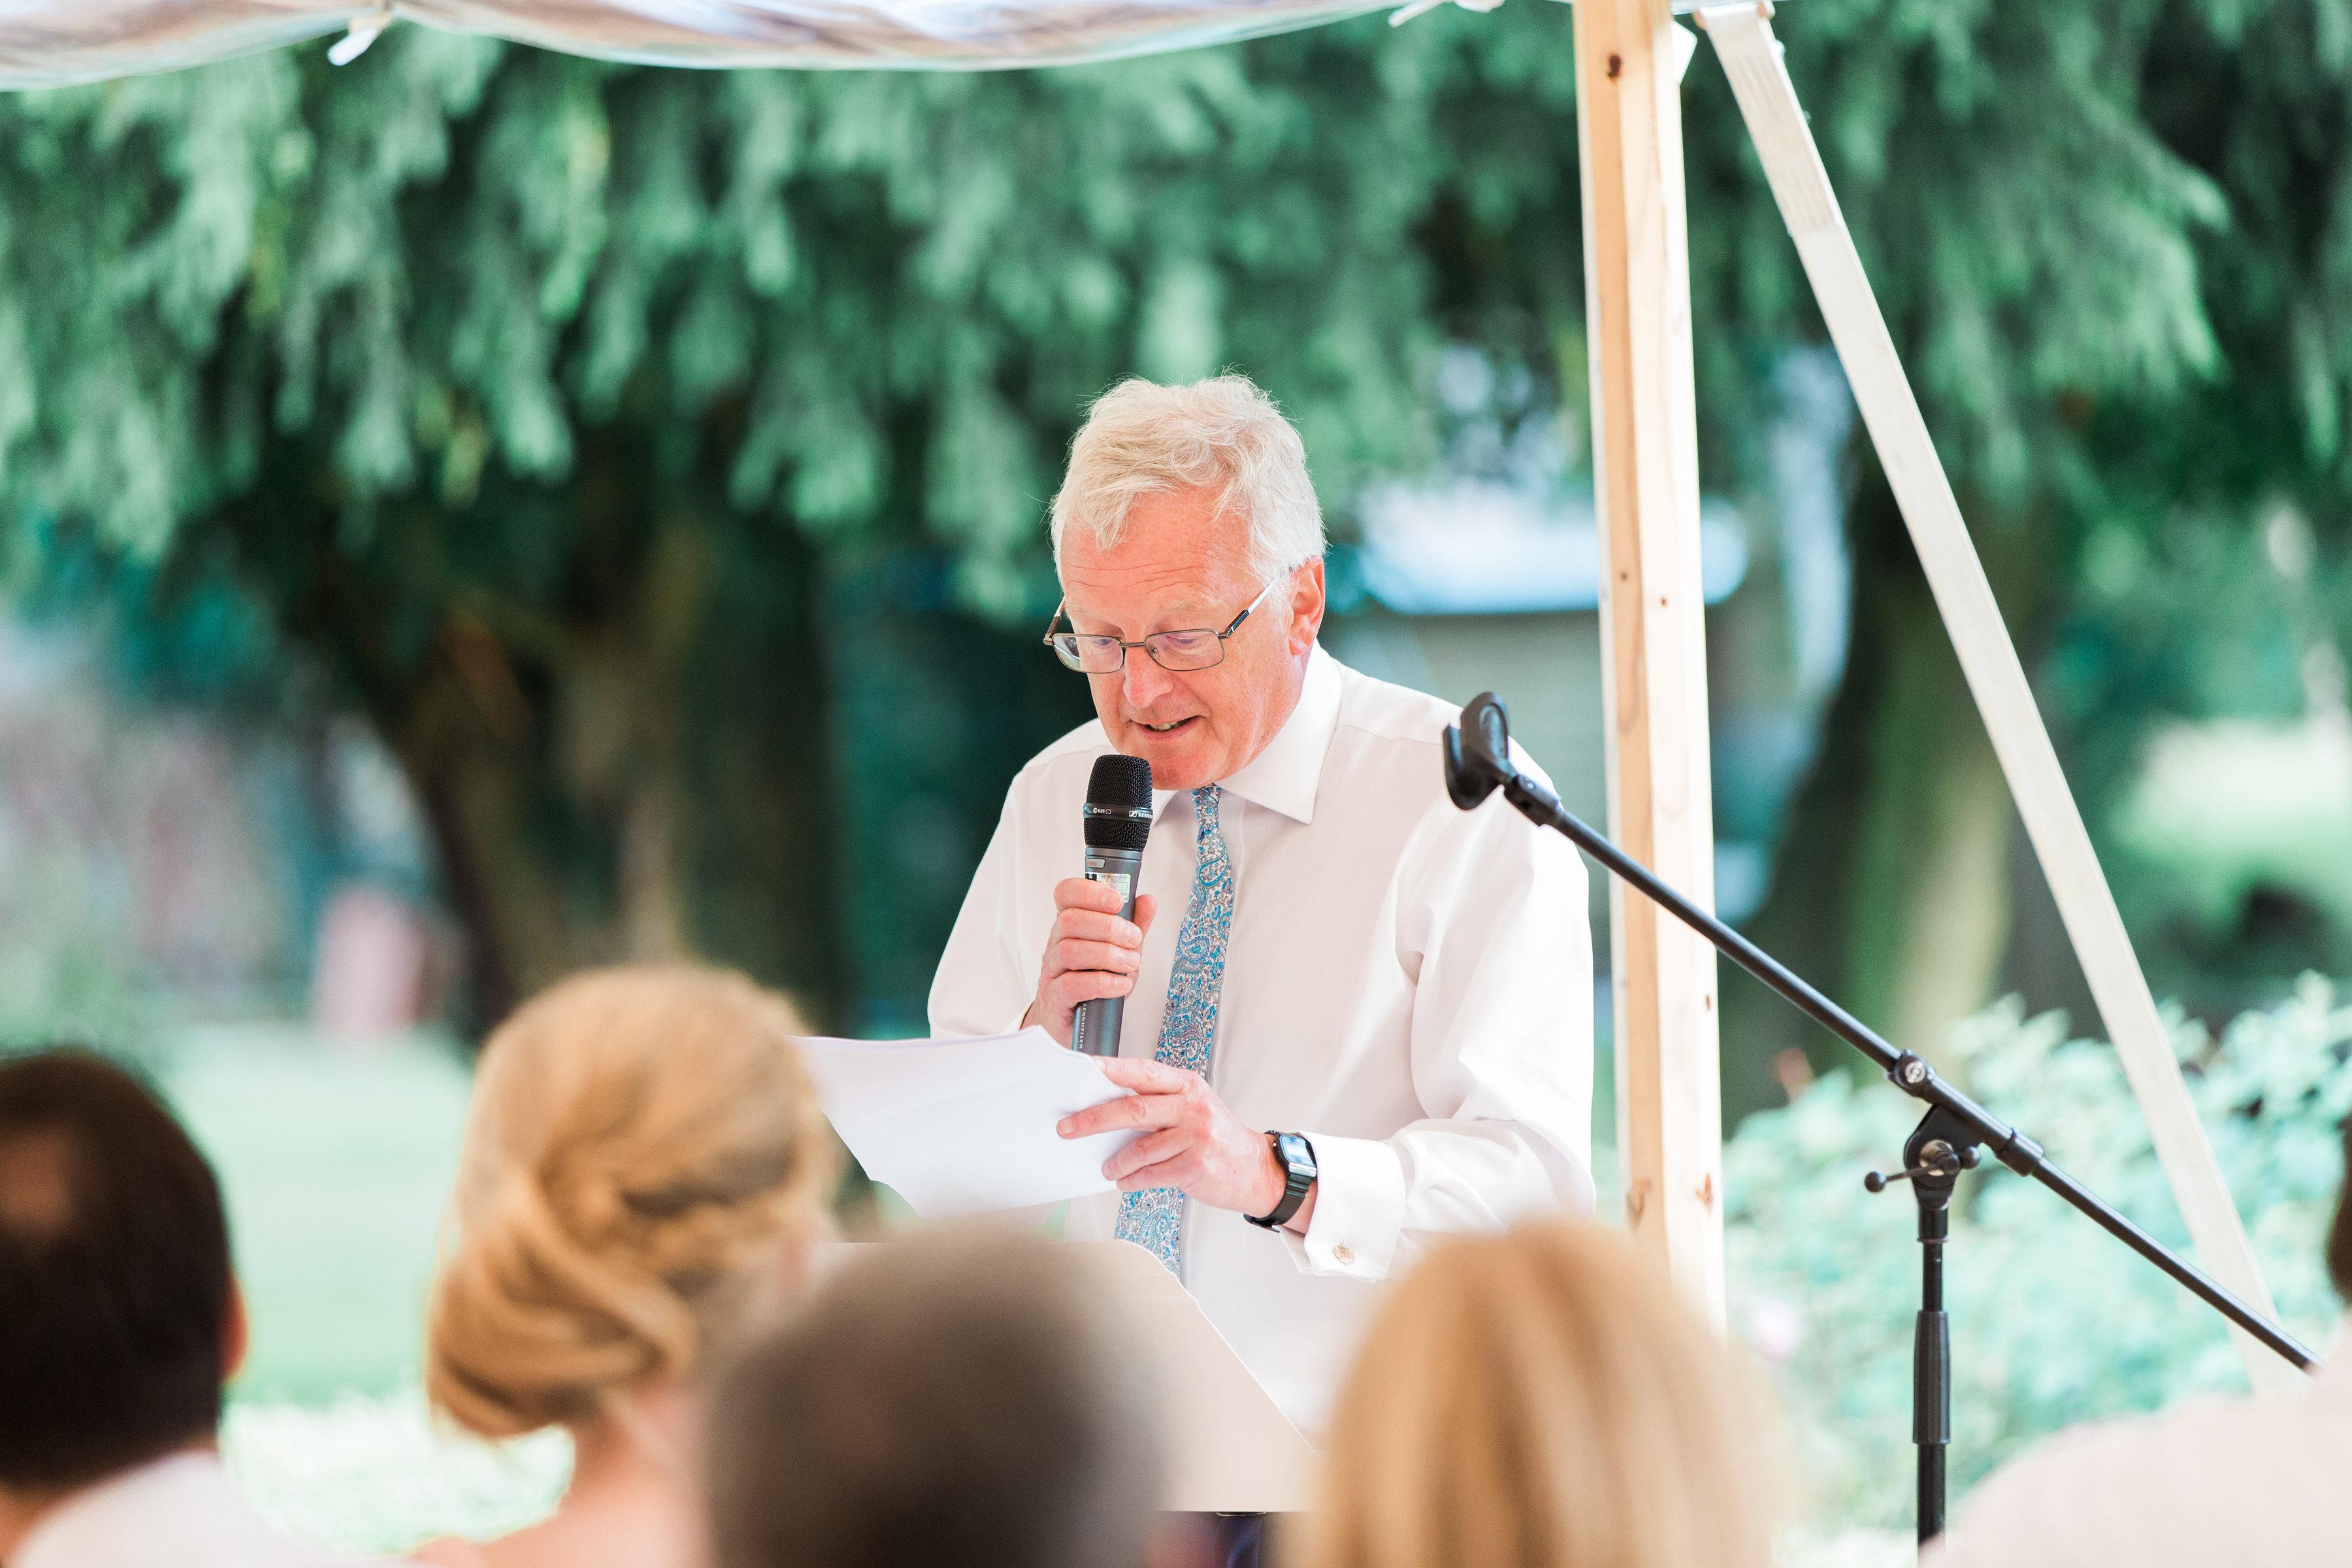 Georgie & Ben's PapaKåta Sperry Tent wedding at Newington House captured by Lucy Davenport: Speeches